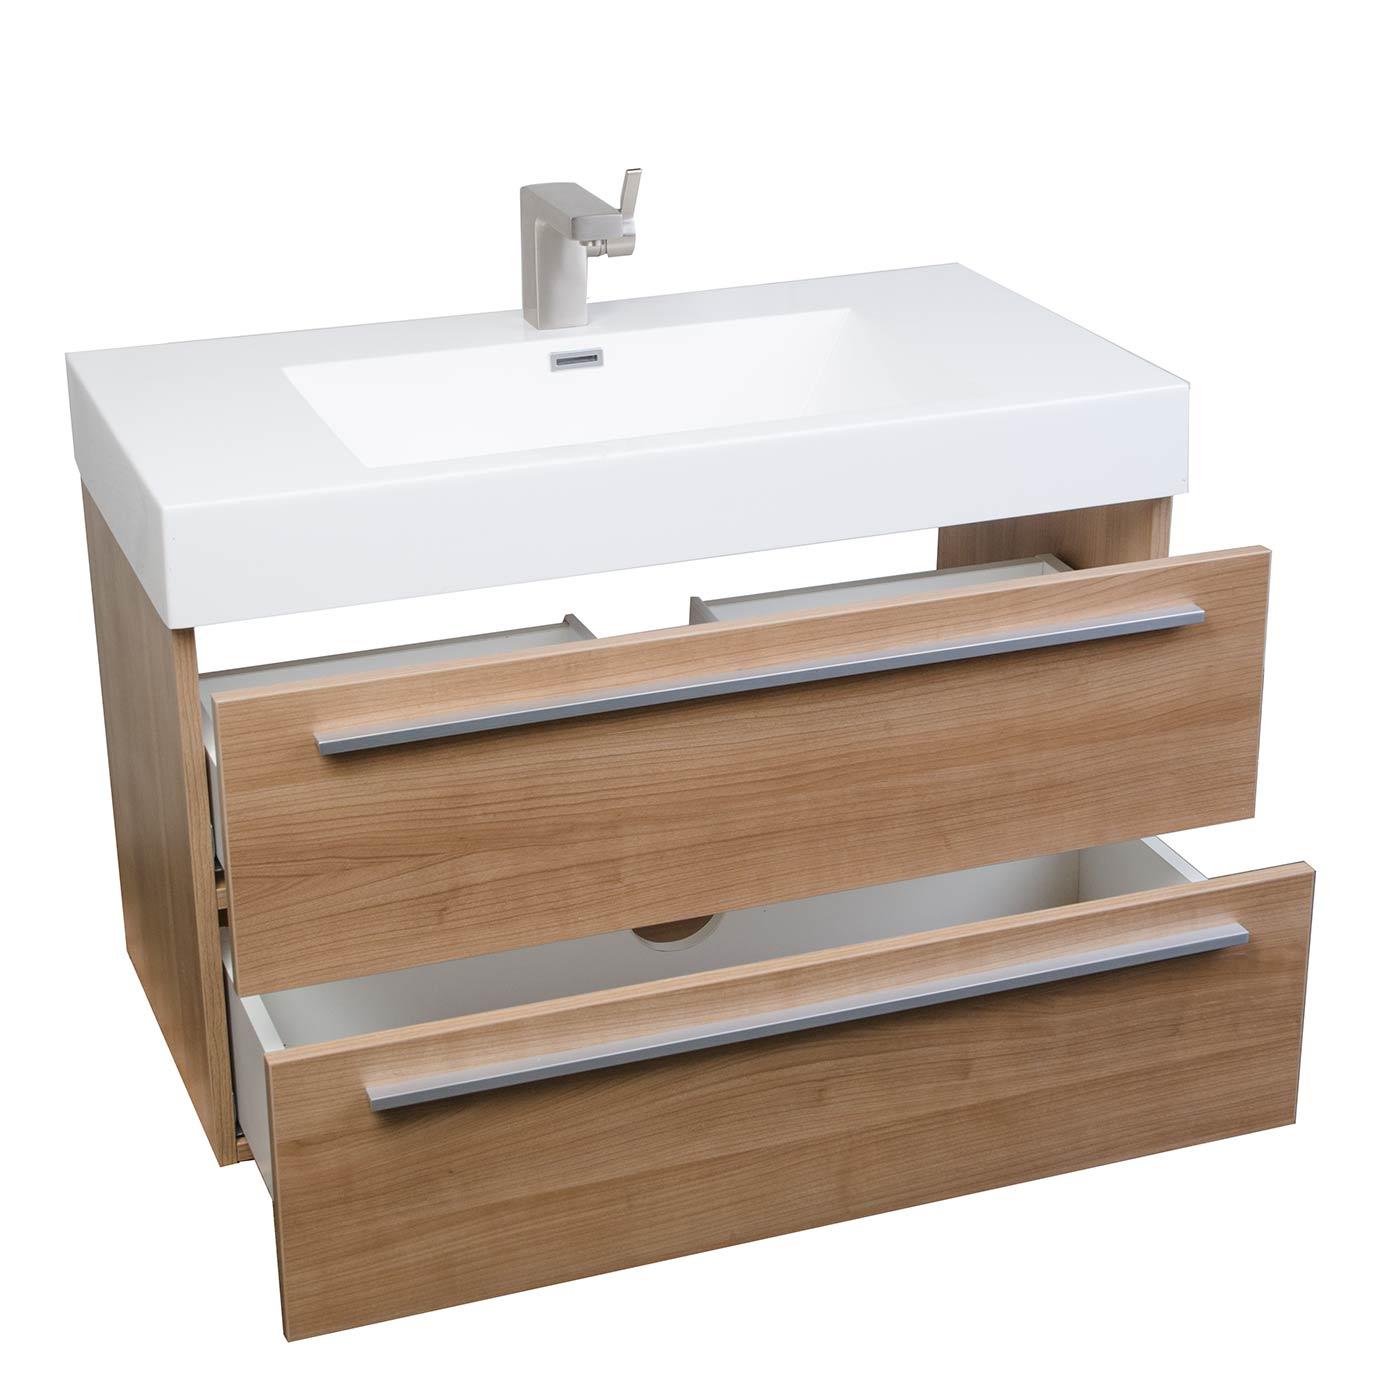 35 5 Wall Mount Contemporary Bathroom Vanity Light Cherry Tn M900 Lc Conceptbaths Com